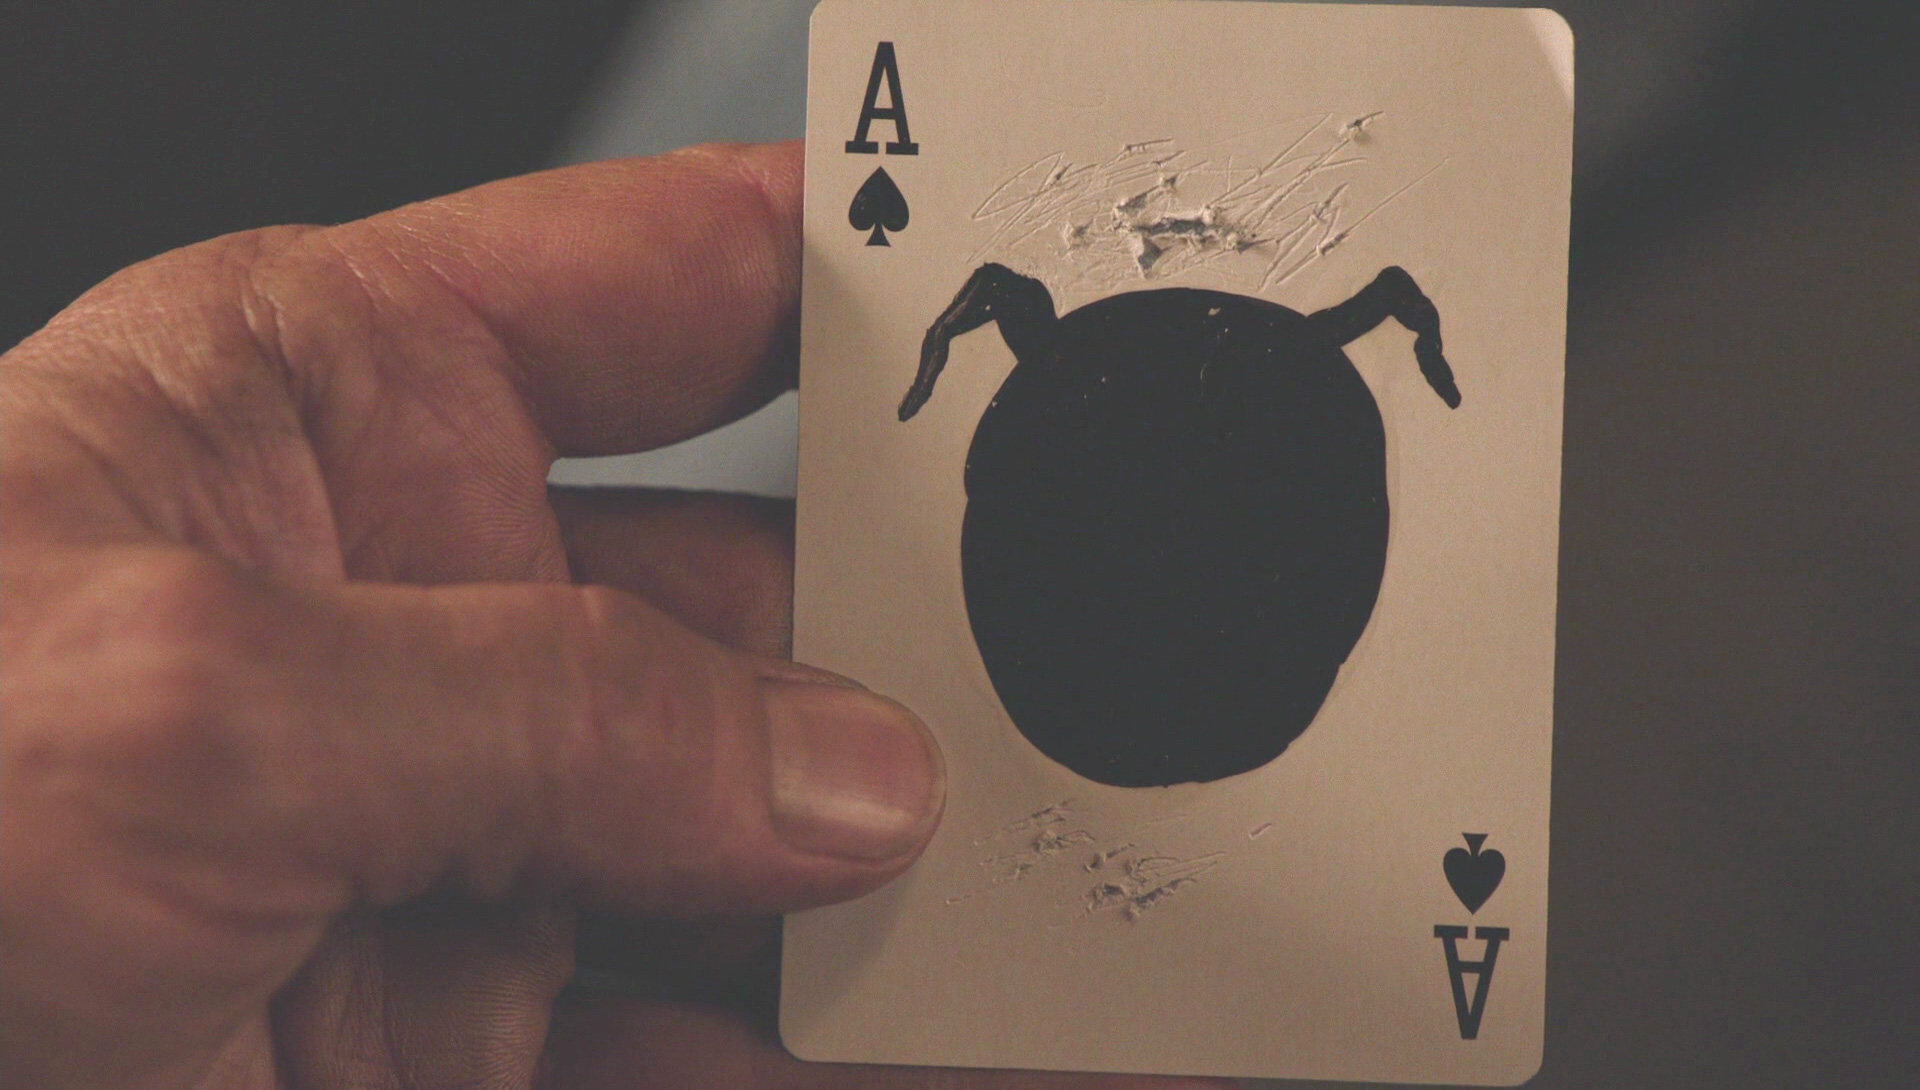 Afbeeldingsresultaat voor playing card symbol Twin Peaks